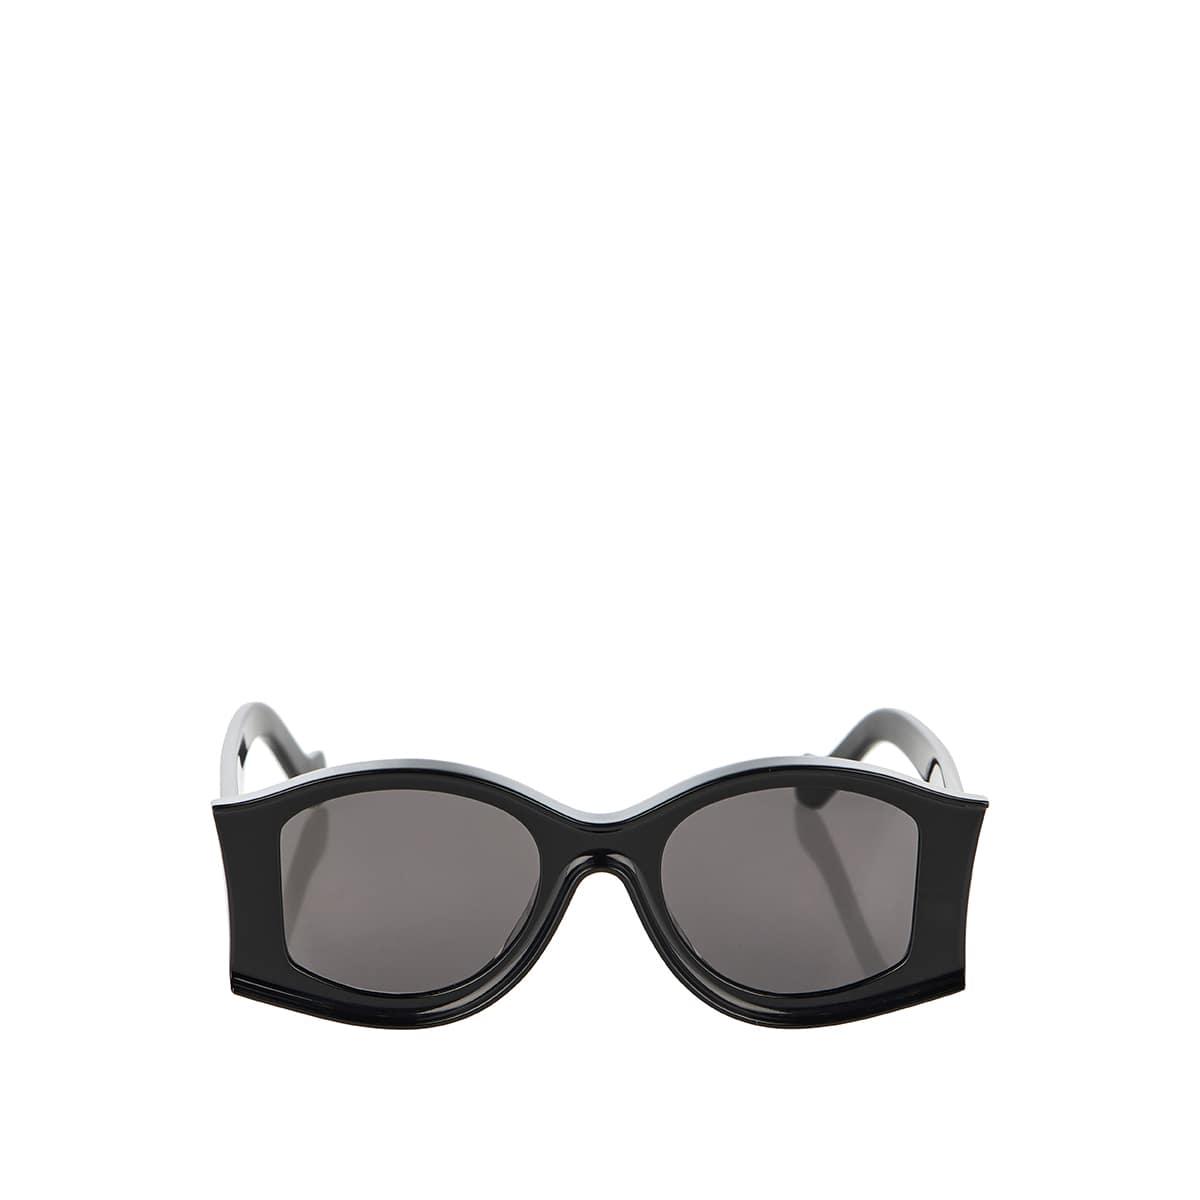 Paula's Ibiza large sunglasses